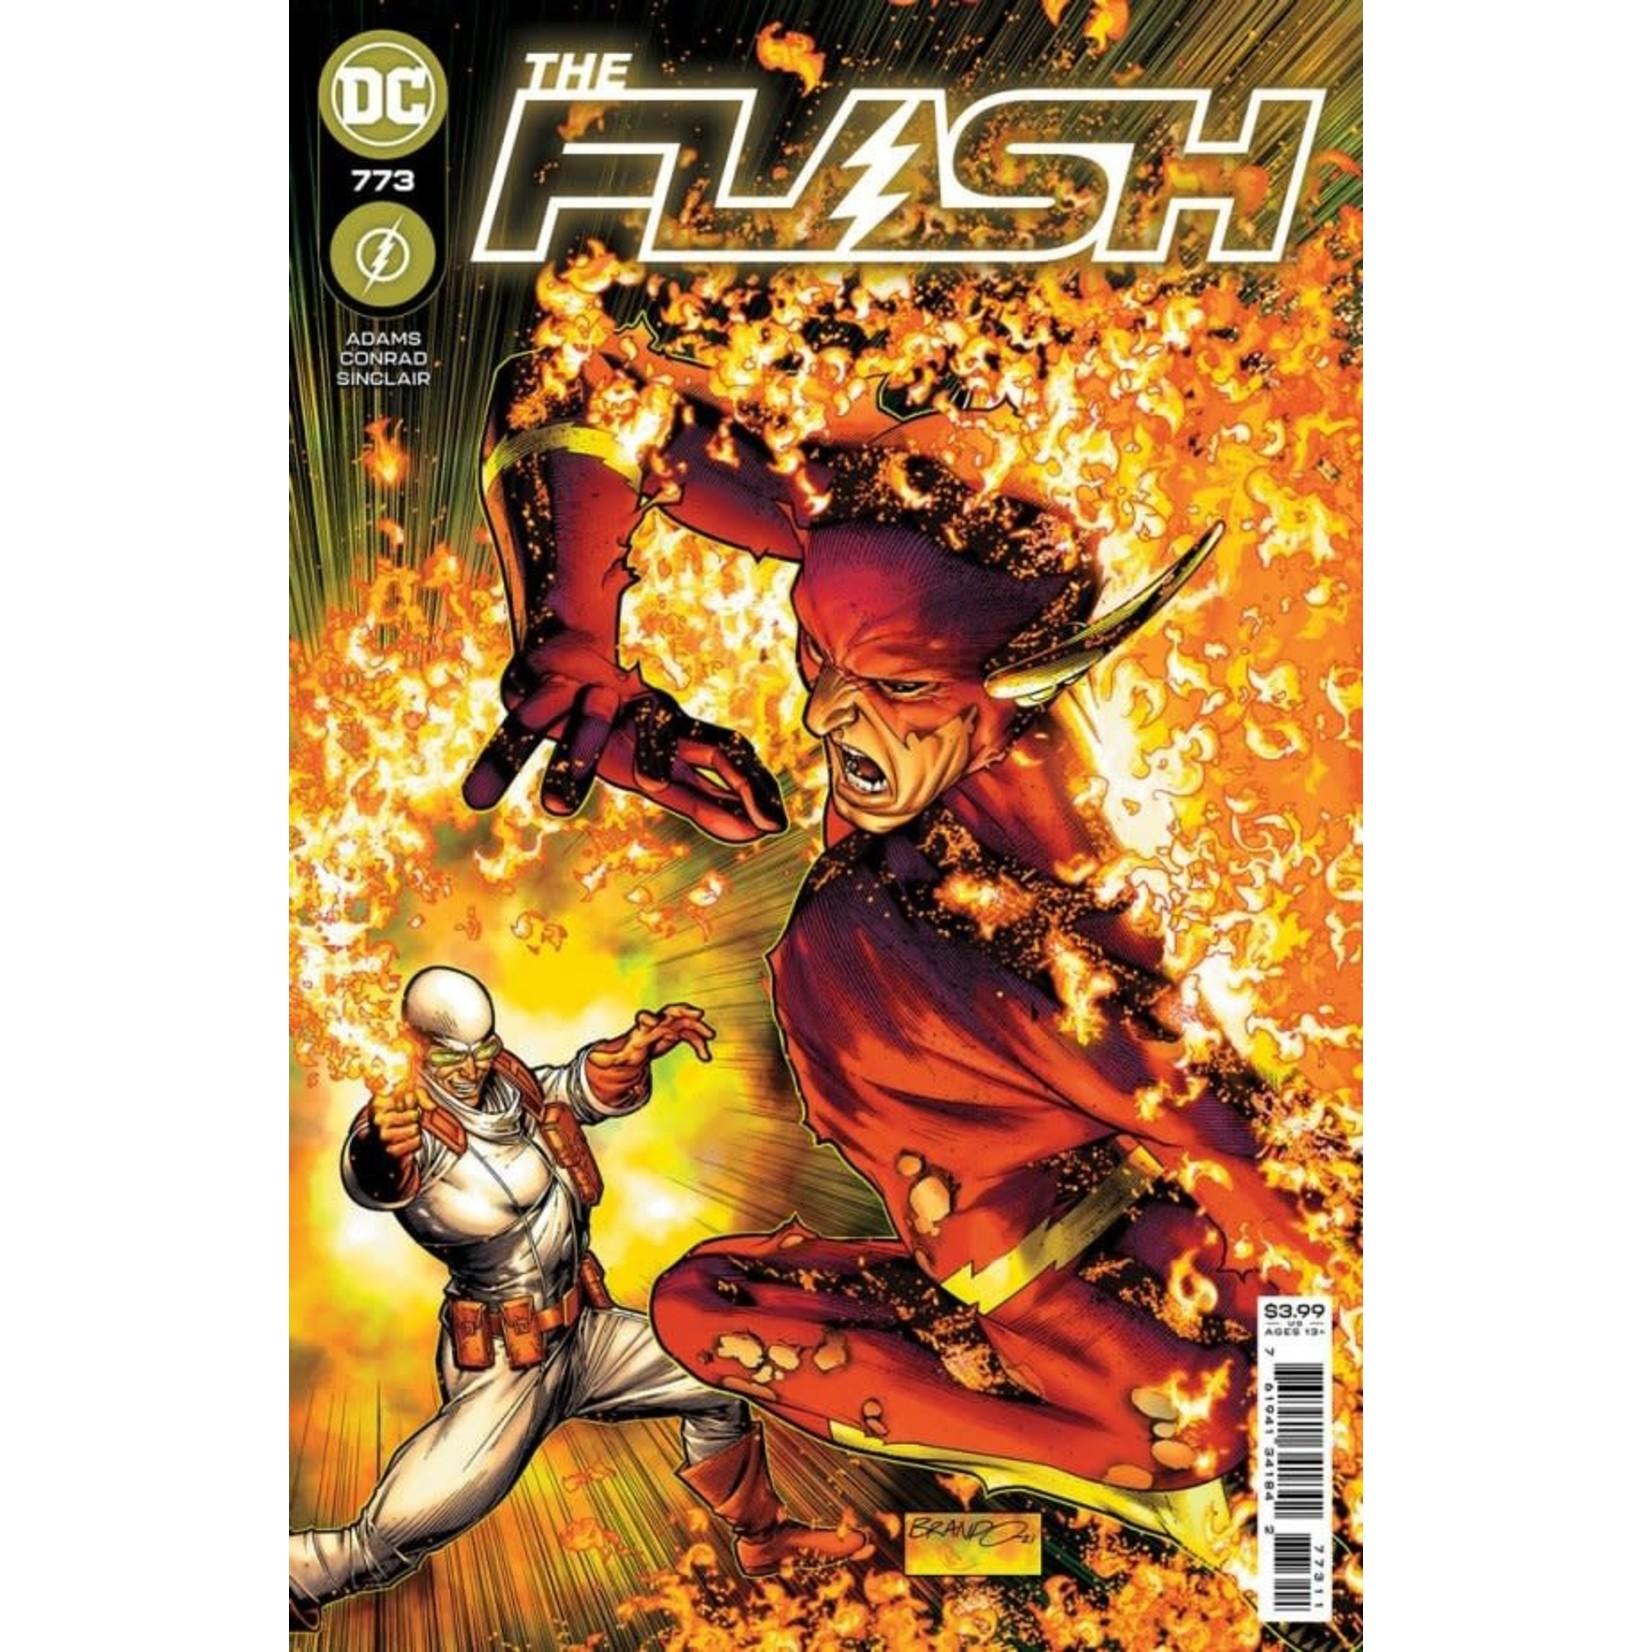 DC Comics The Flash #773